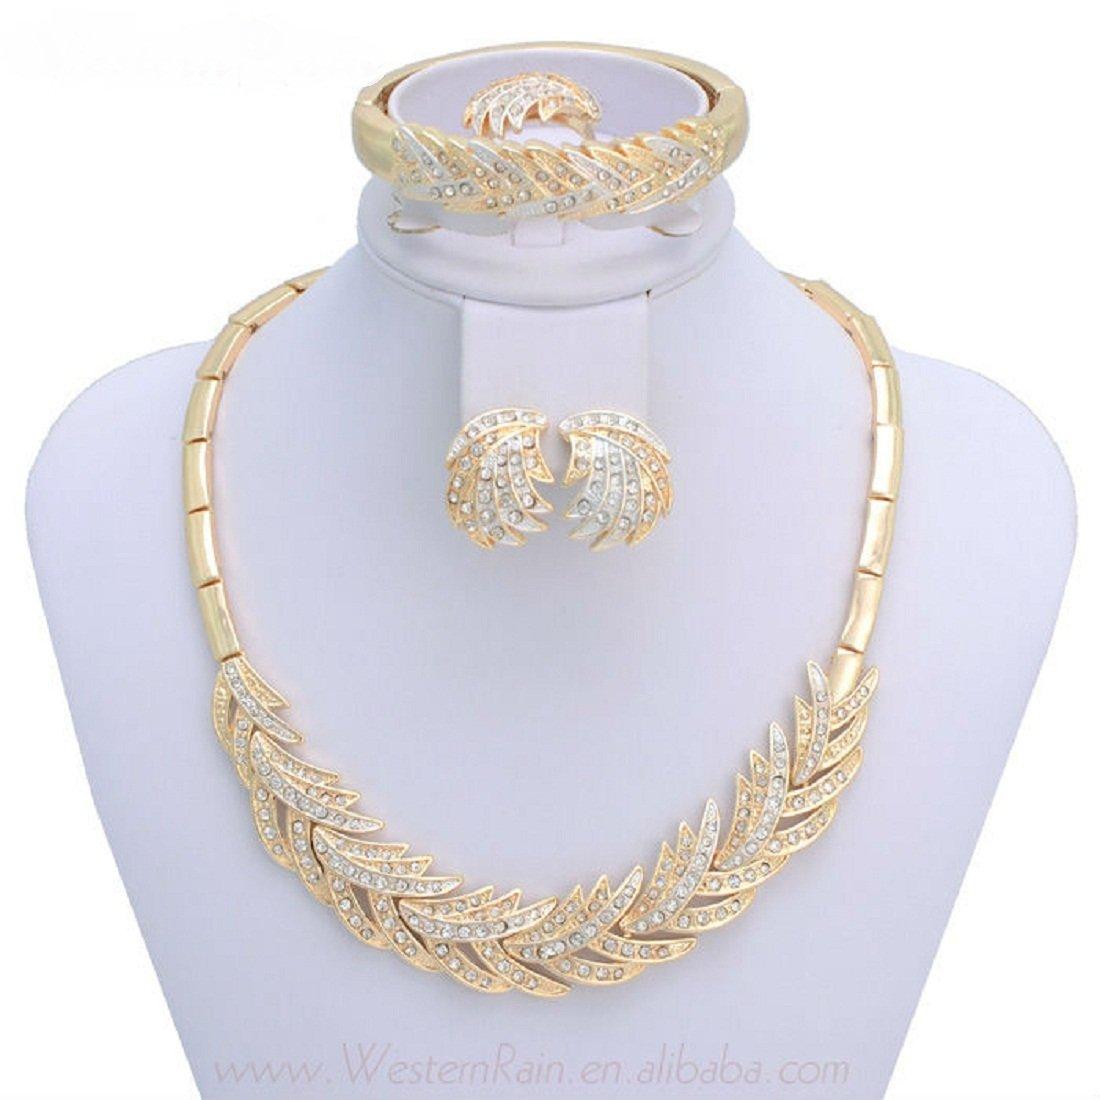 18k Gold Plated Wedding Jewelry Necklace Set Luxury Women Party Set Rhinestone Bridal Fashion Jewelry